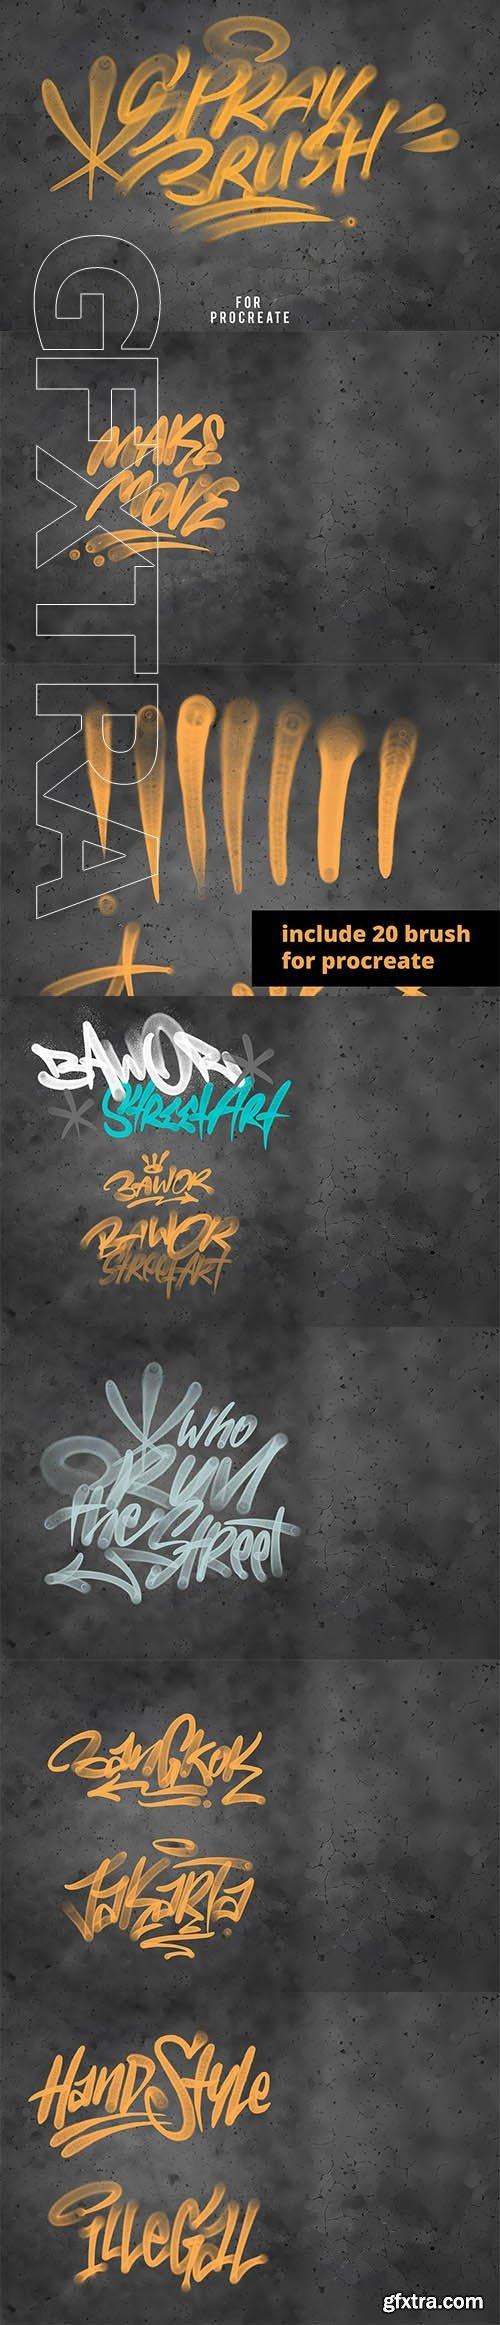 CreativeMarket - Procreate Graffiti Brush Set 3717940